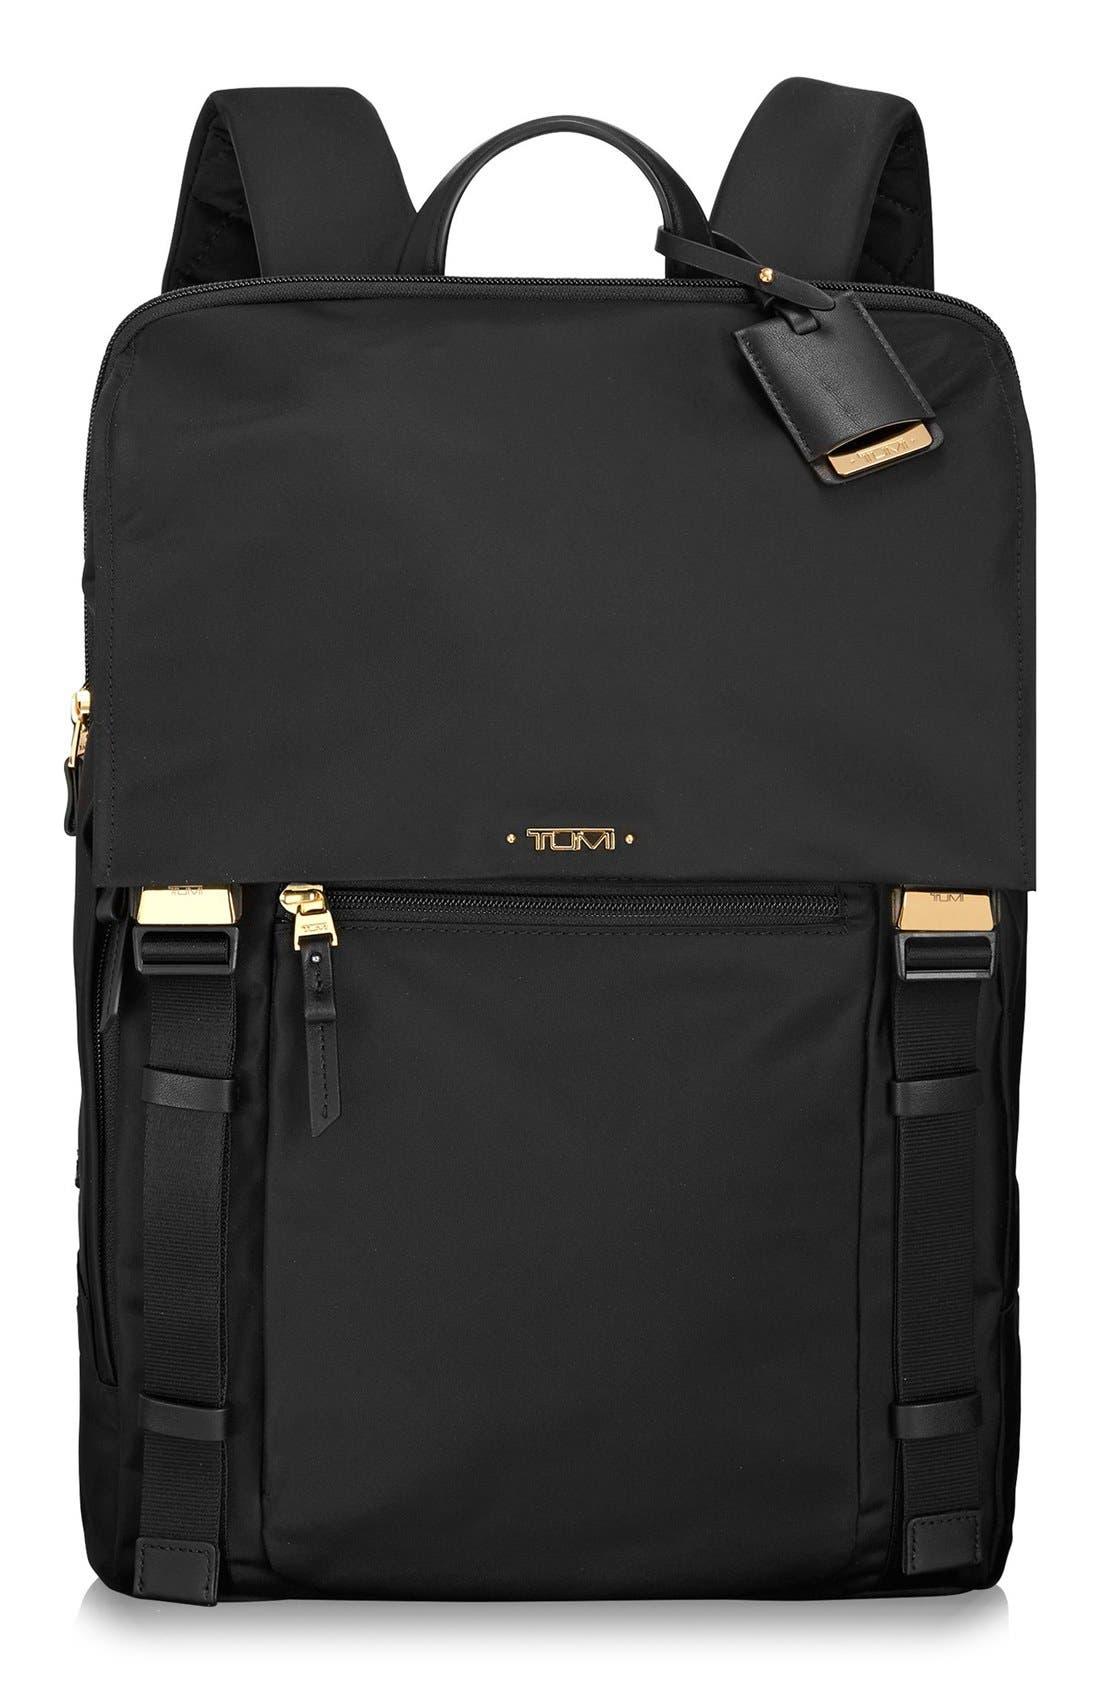 Alternate Image 1 Selected - Tumi 'Voyageur - Sacha' Flap Backpack